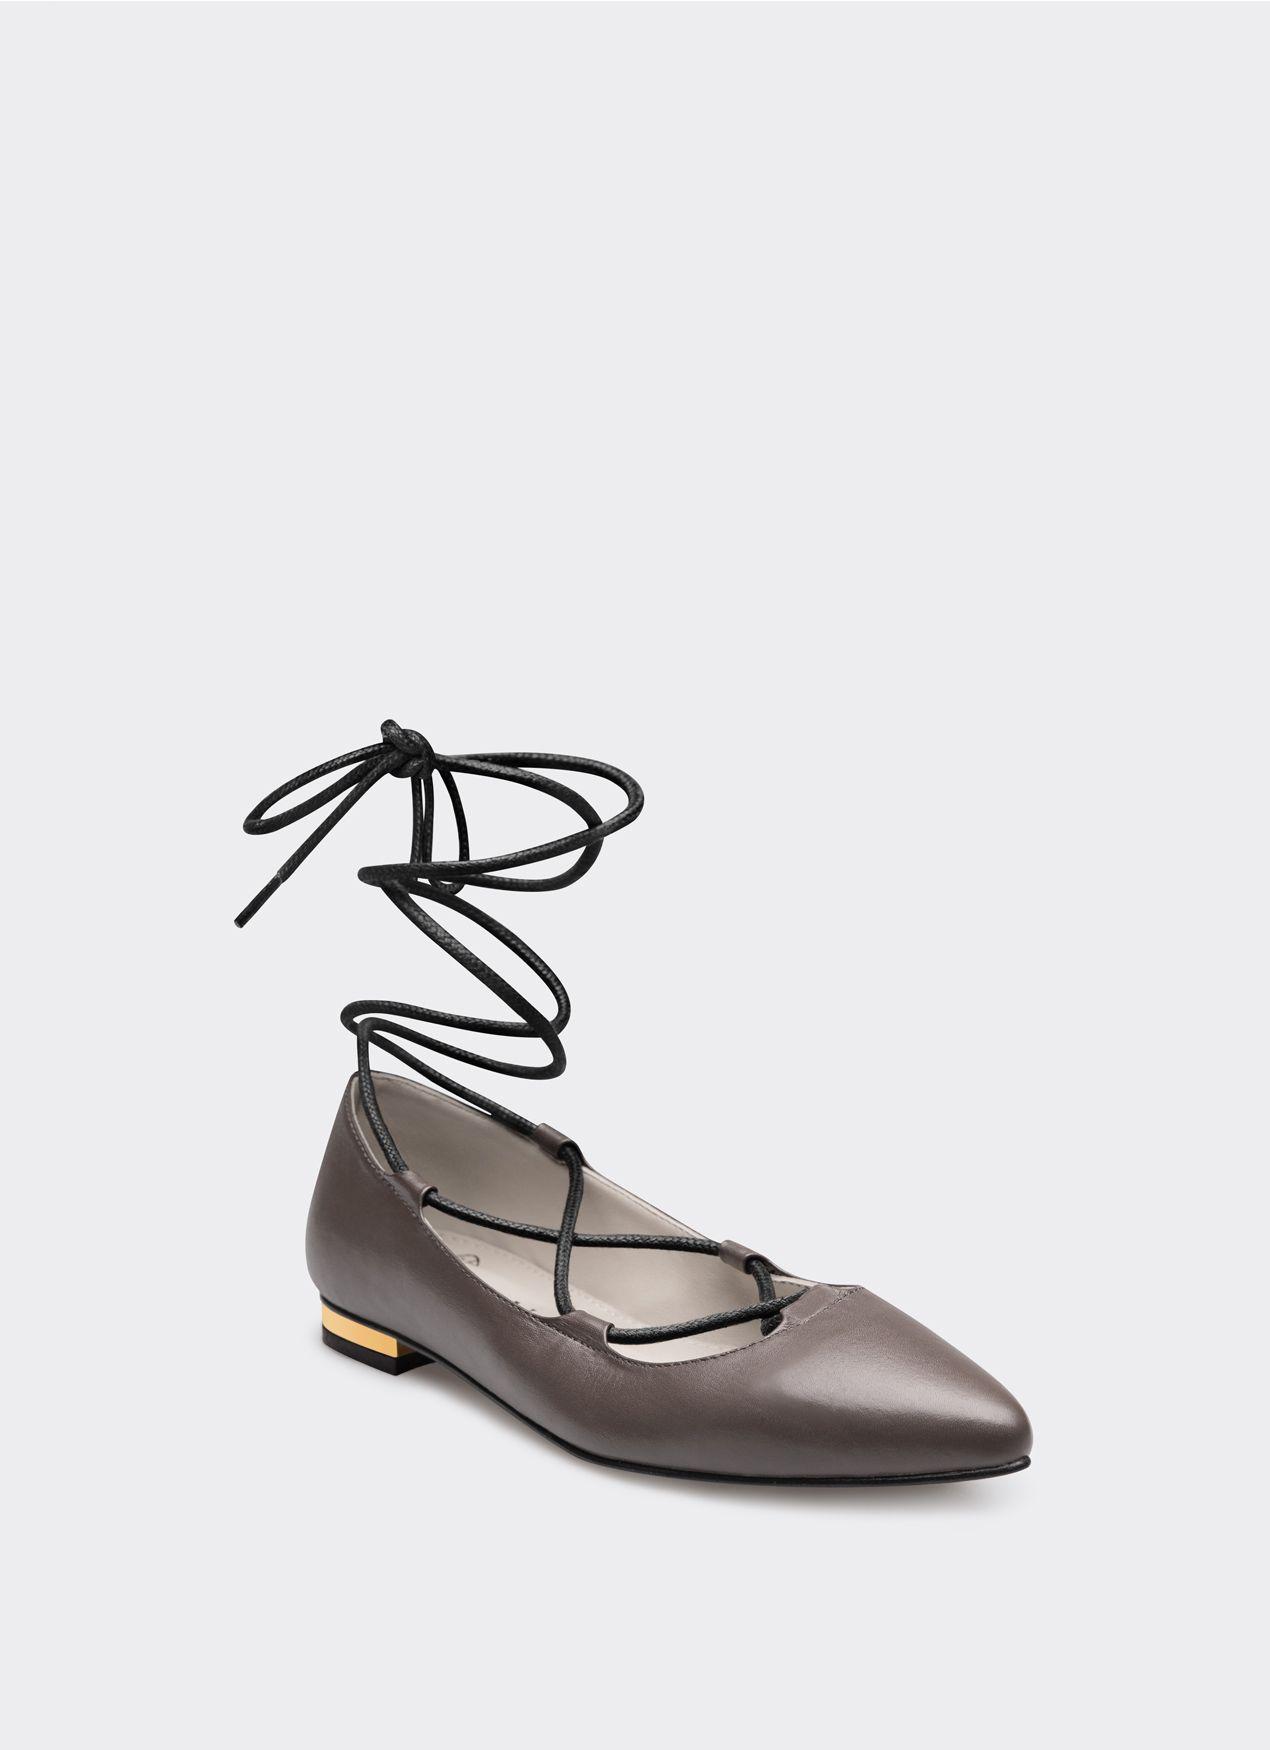 #PopbelaOOTD: Saatnya Tampil Maksimal dengan Flat Shoes